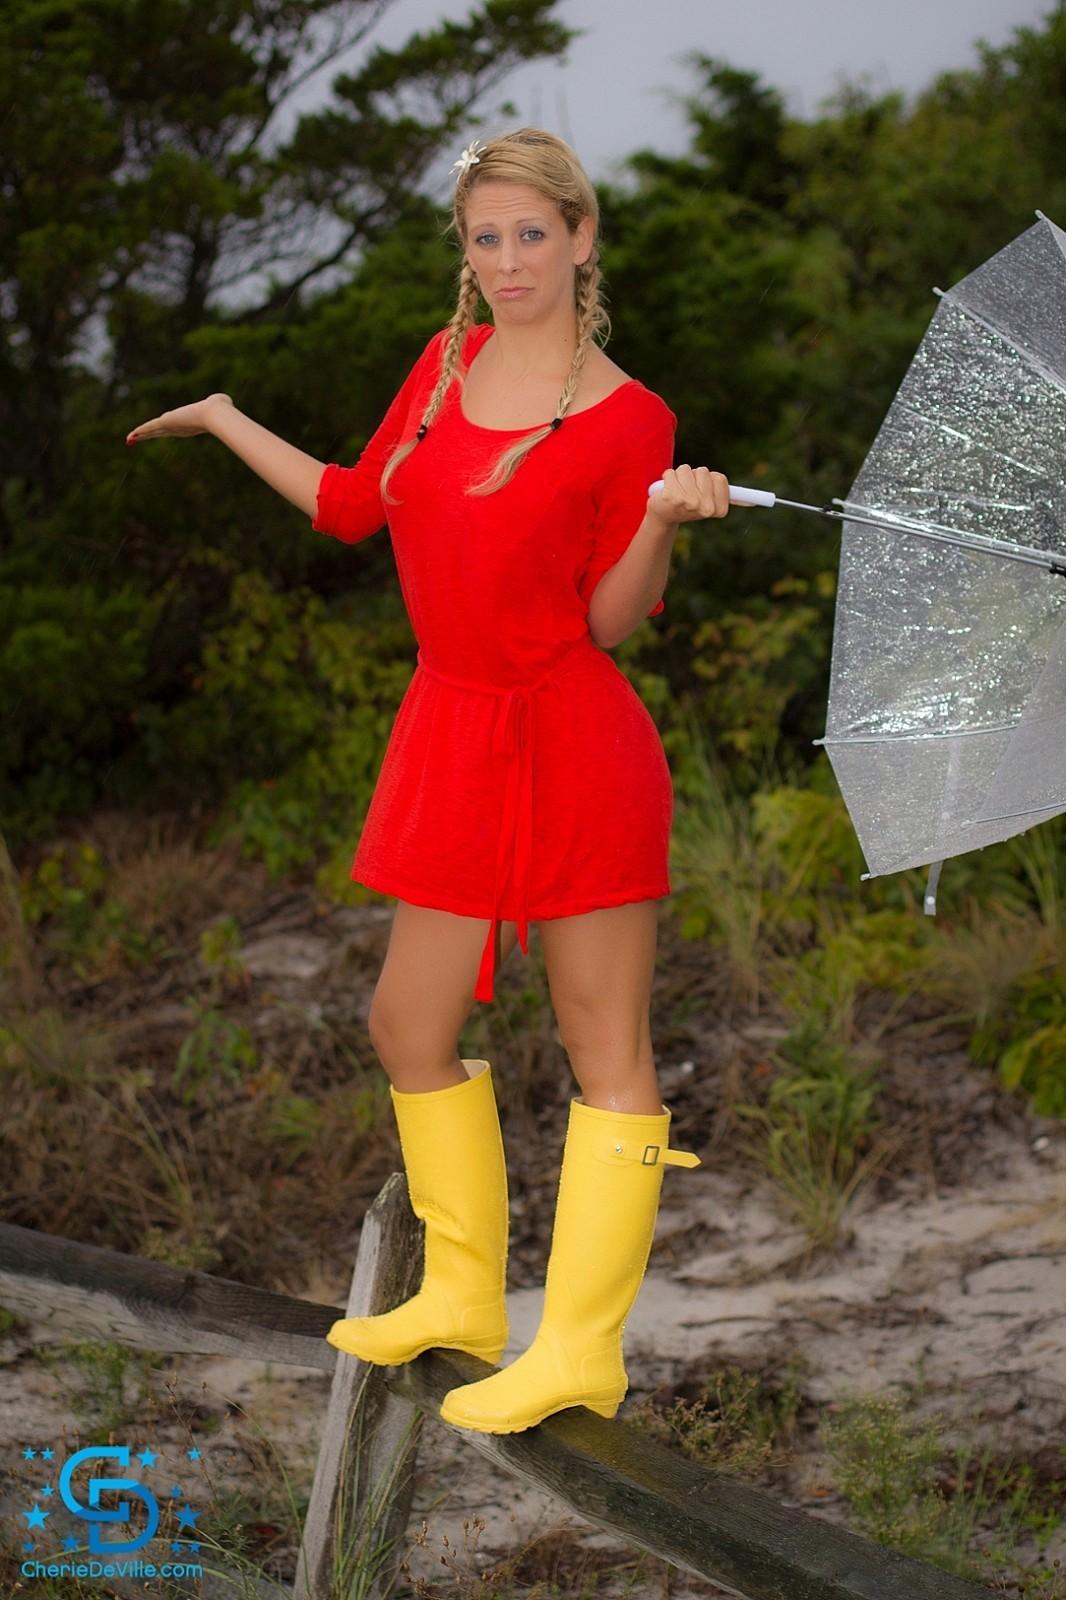 Cherie Deville Big Boobs Red Minidress and Umbrella